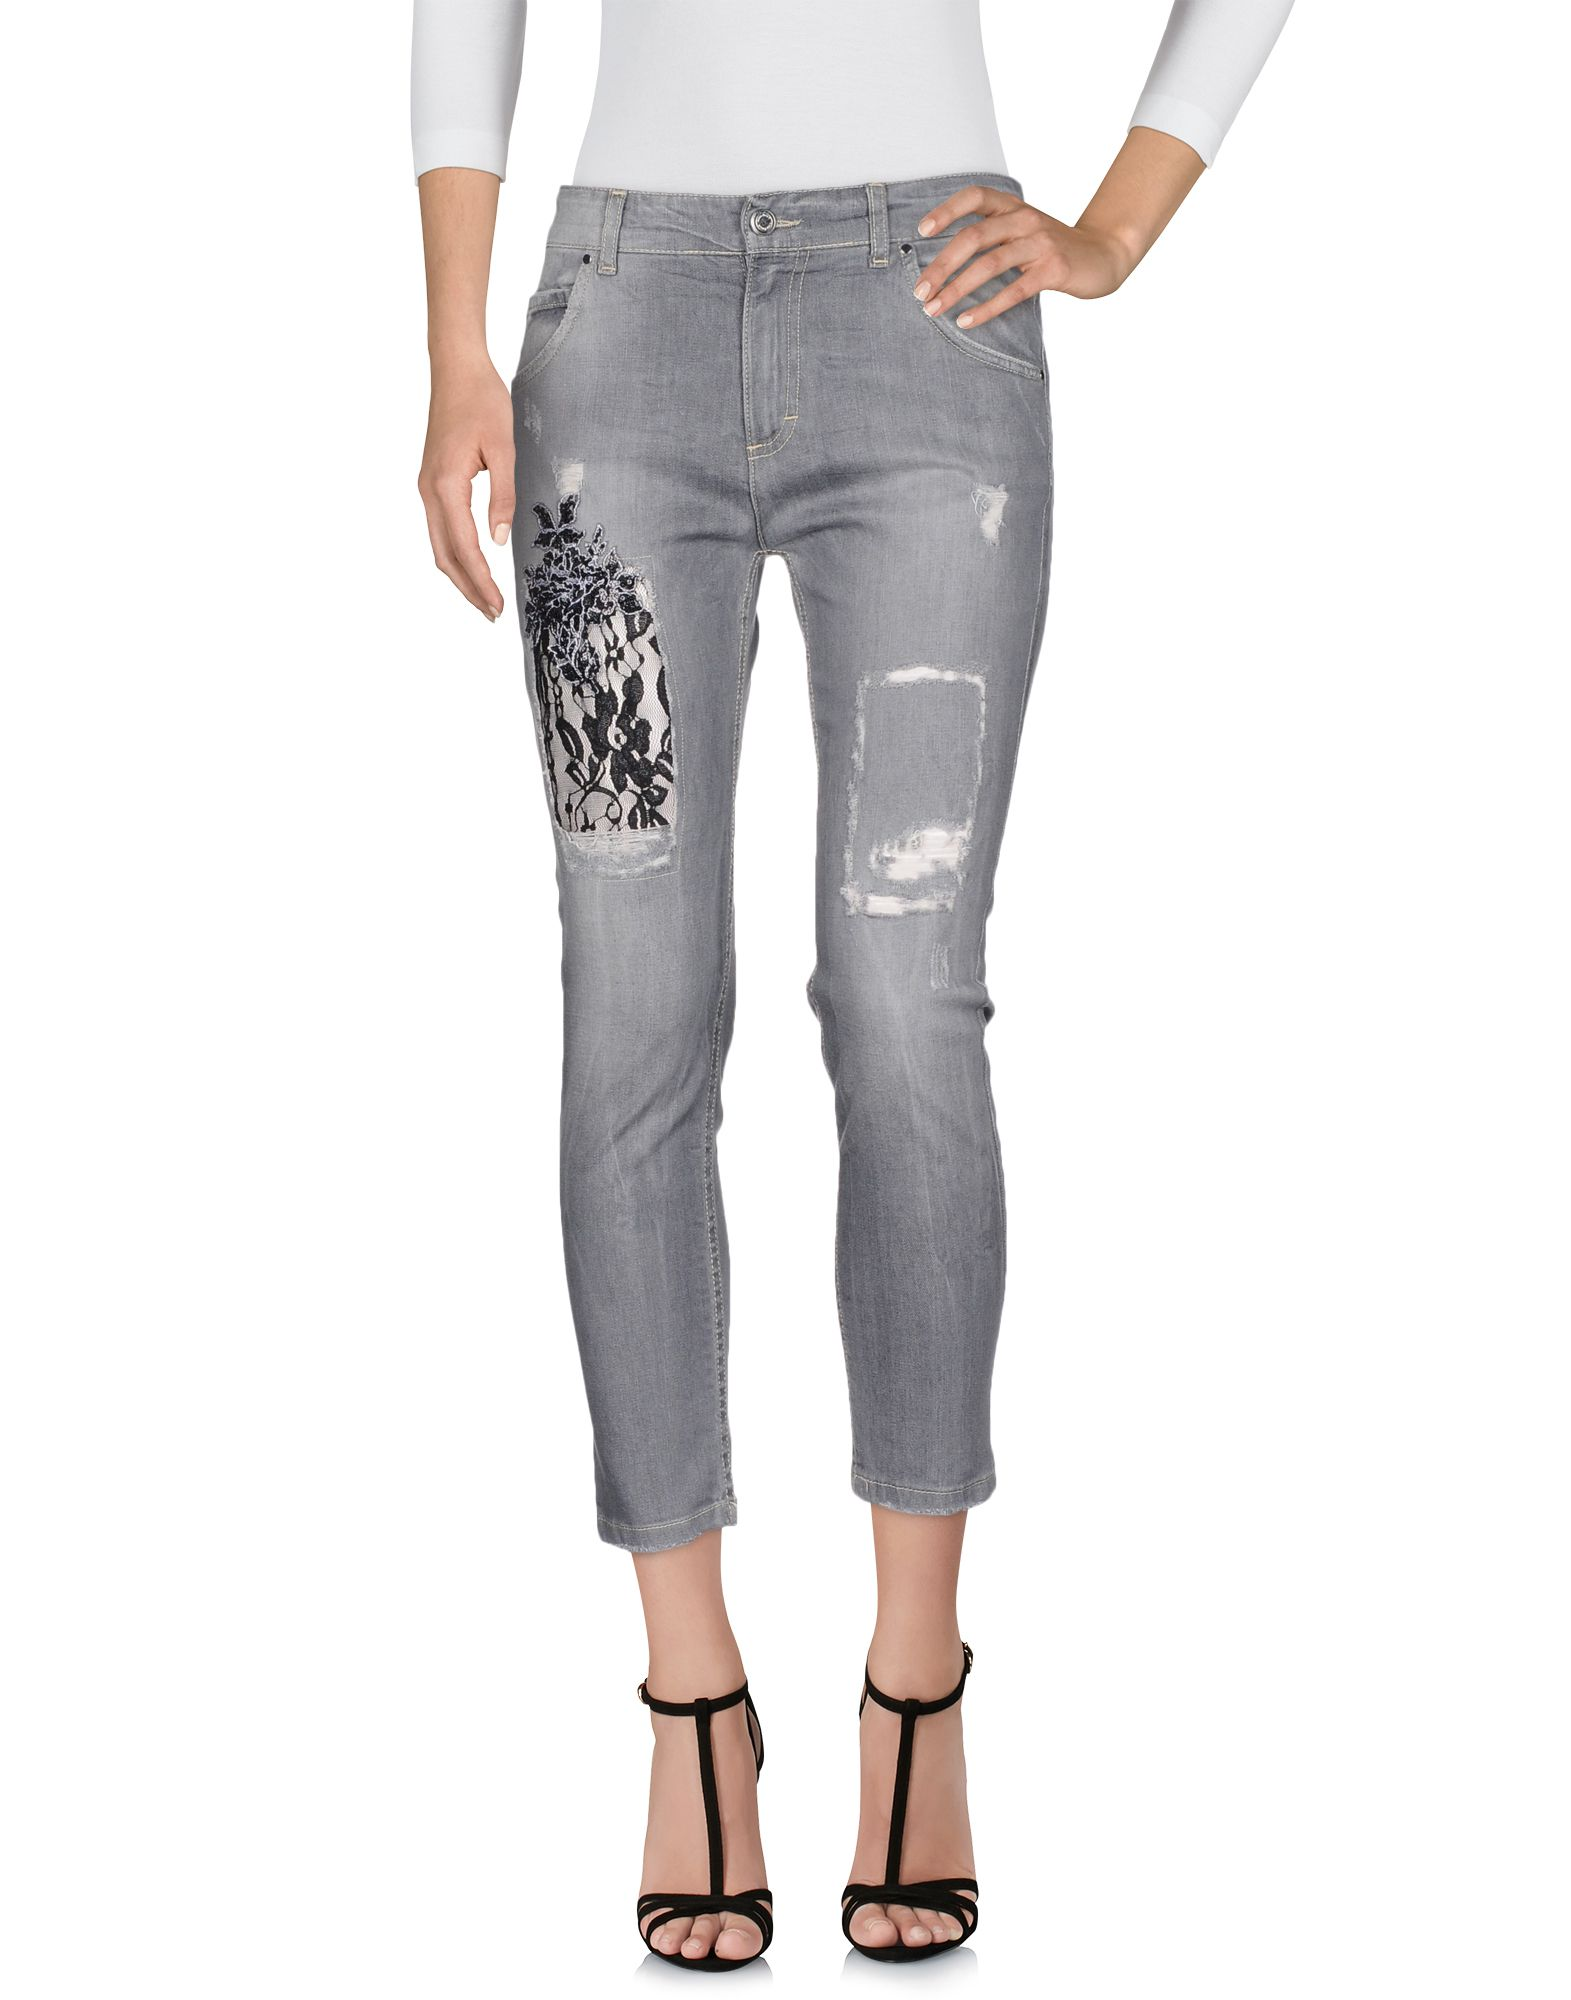 Pantaloni Jeans Annarita N Twenty 4H Donna - Acquista online su fX55mbRlL